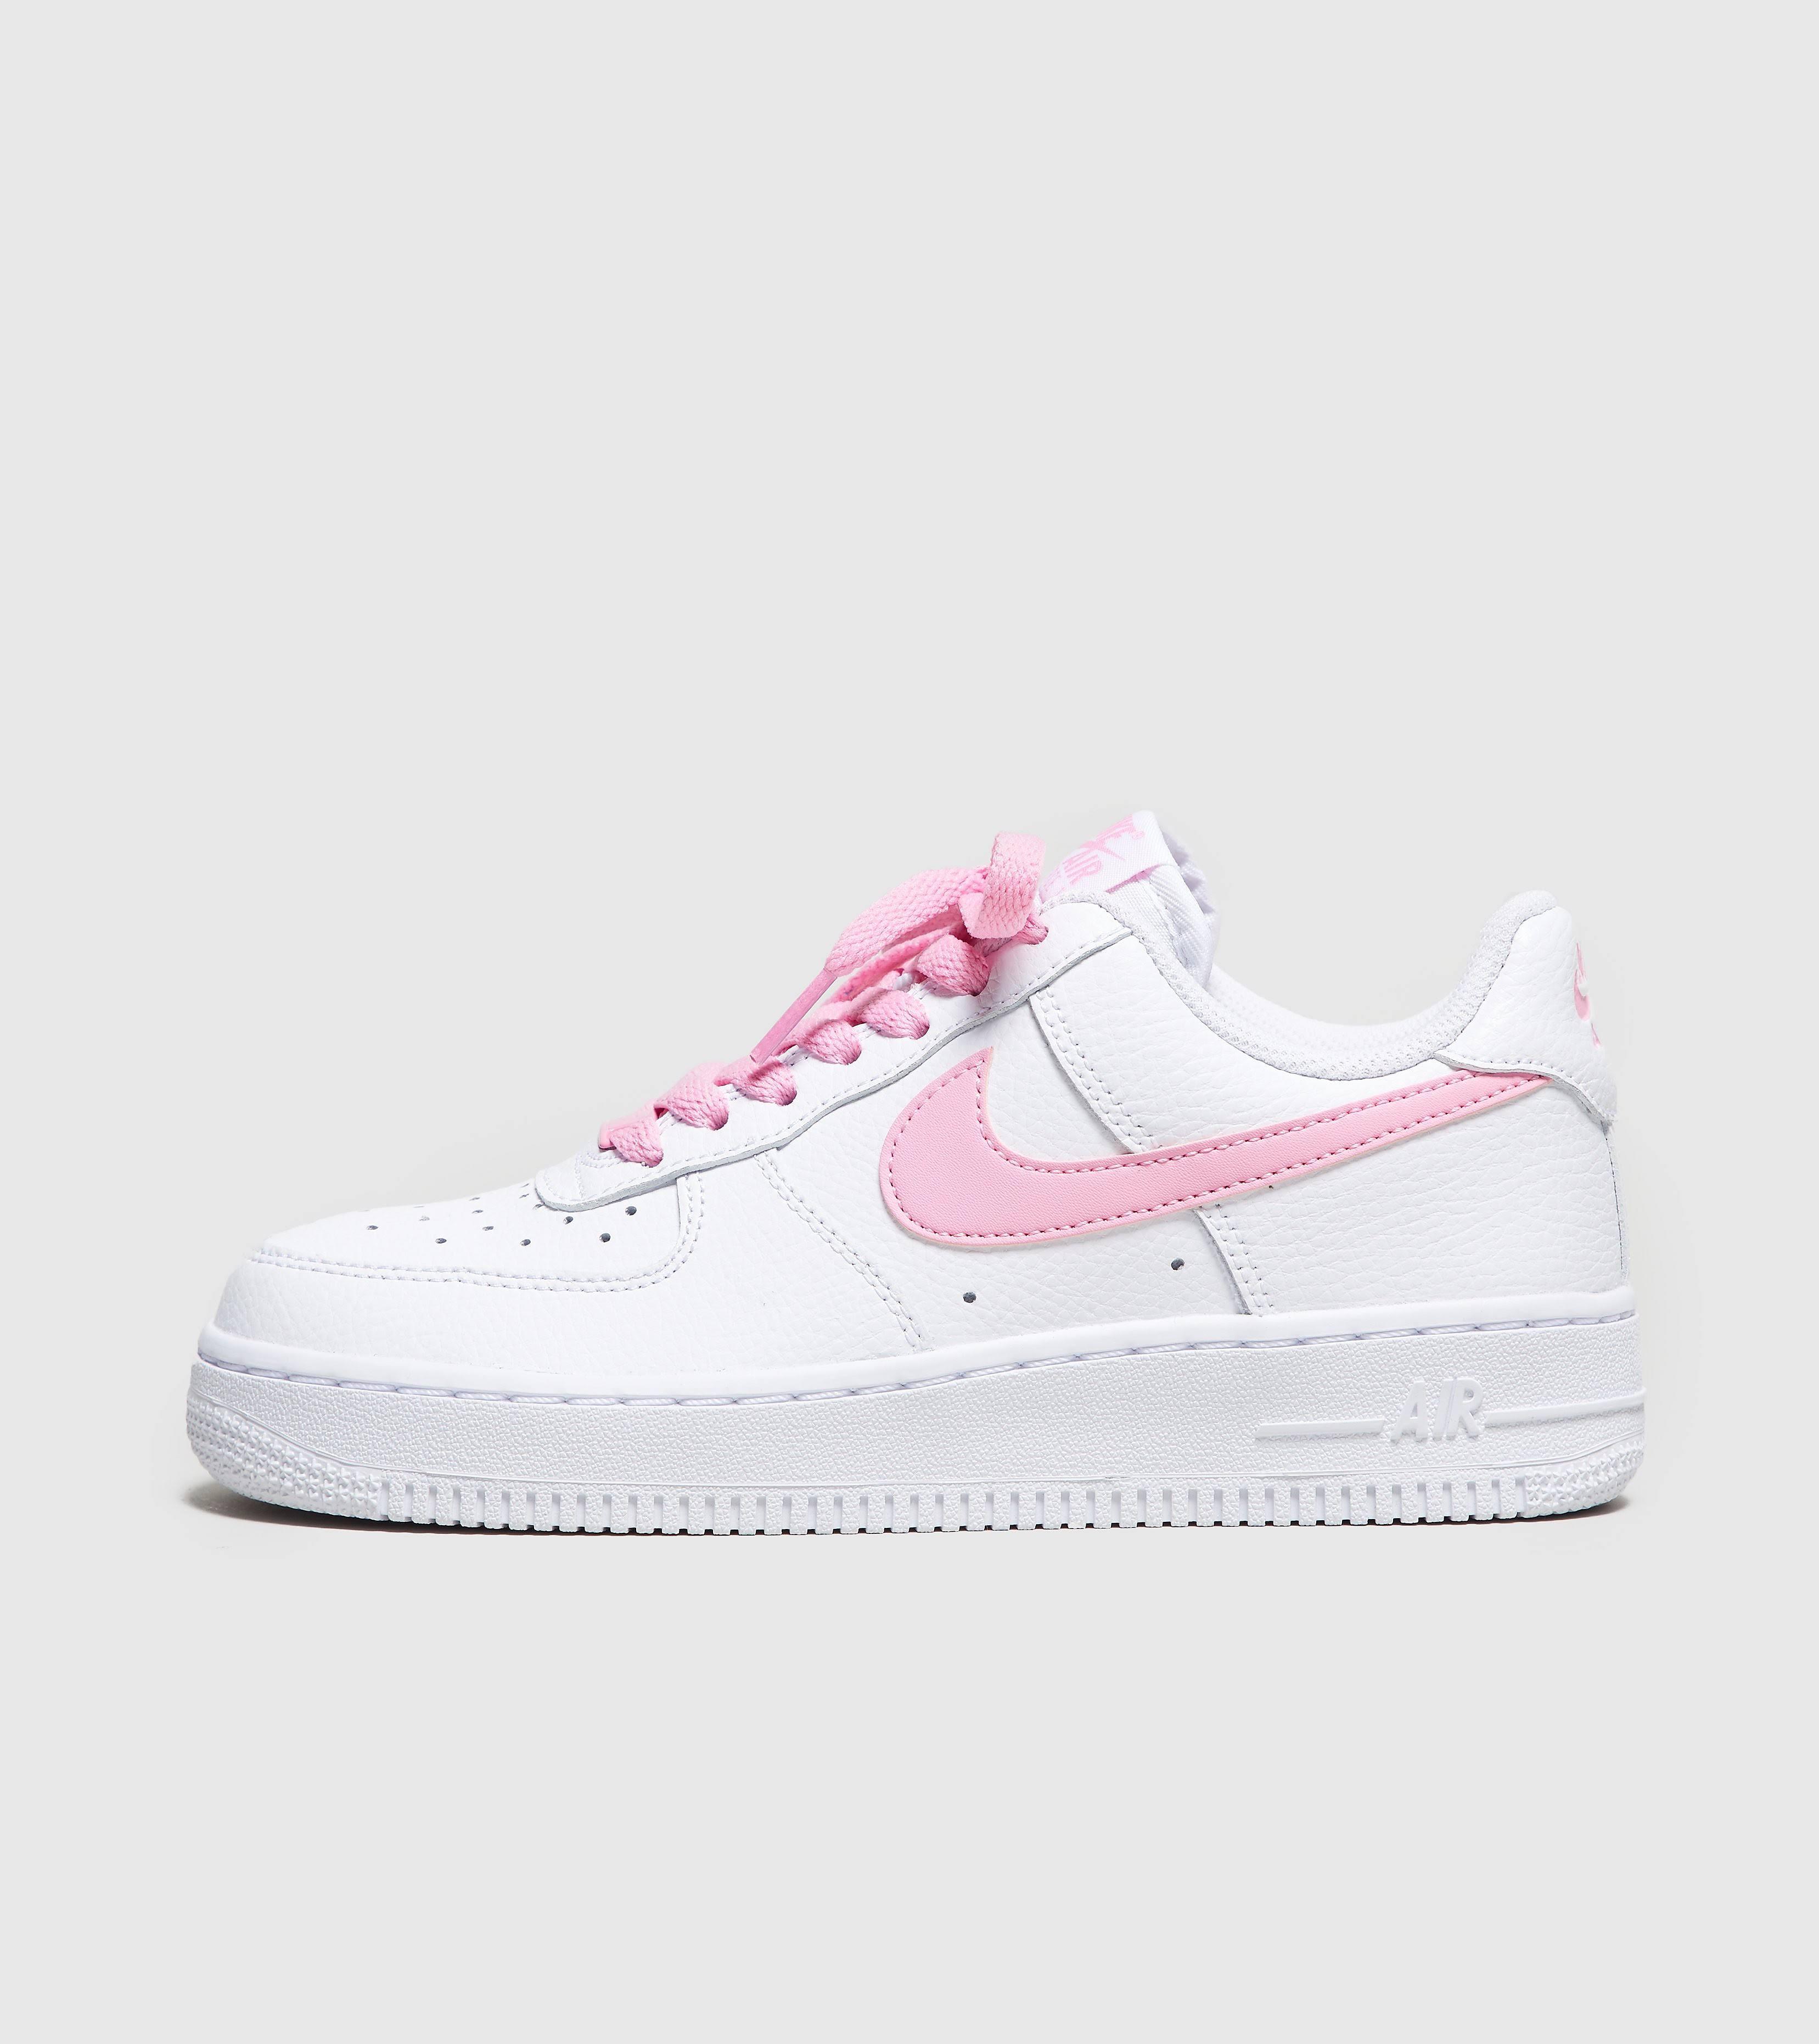 Force '07 Air Wmns white Sneaker Pink weiß Ess Nike Mehrfarbig psychic 1 Pink xIgEq66